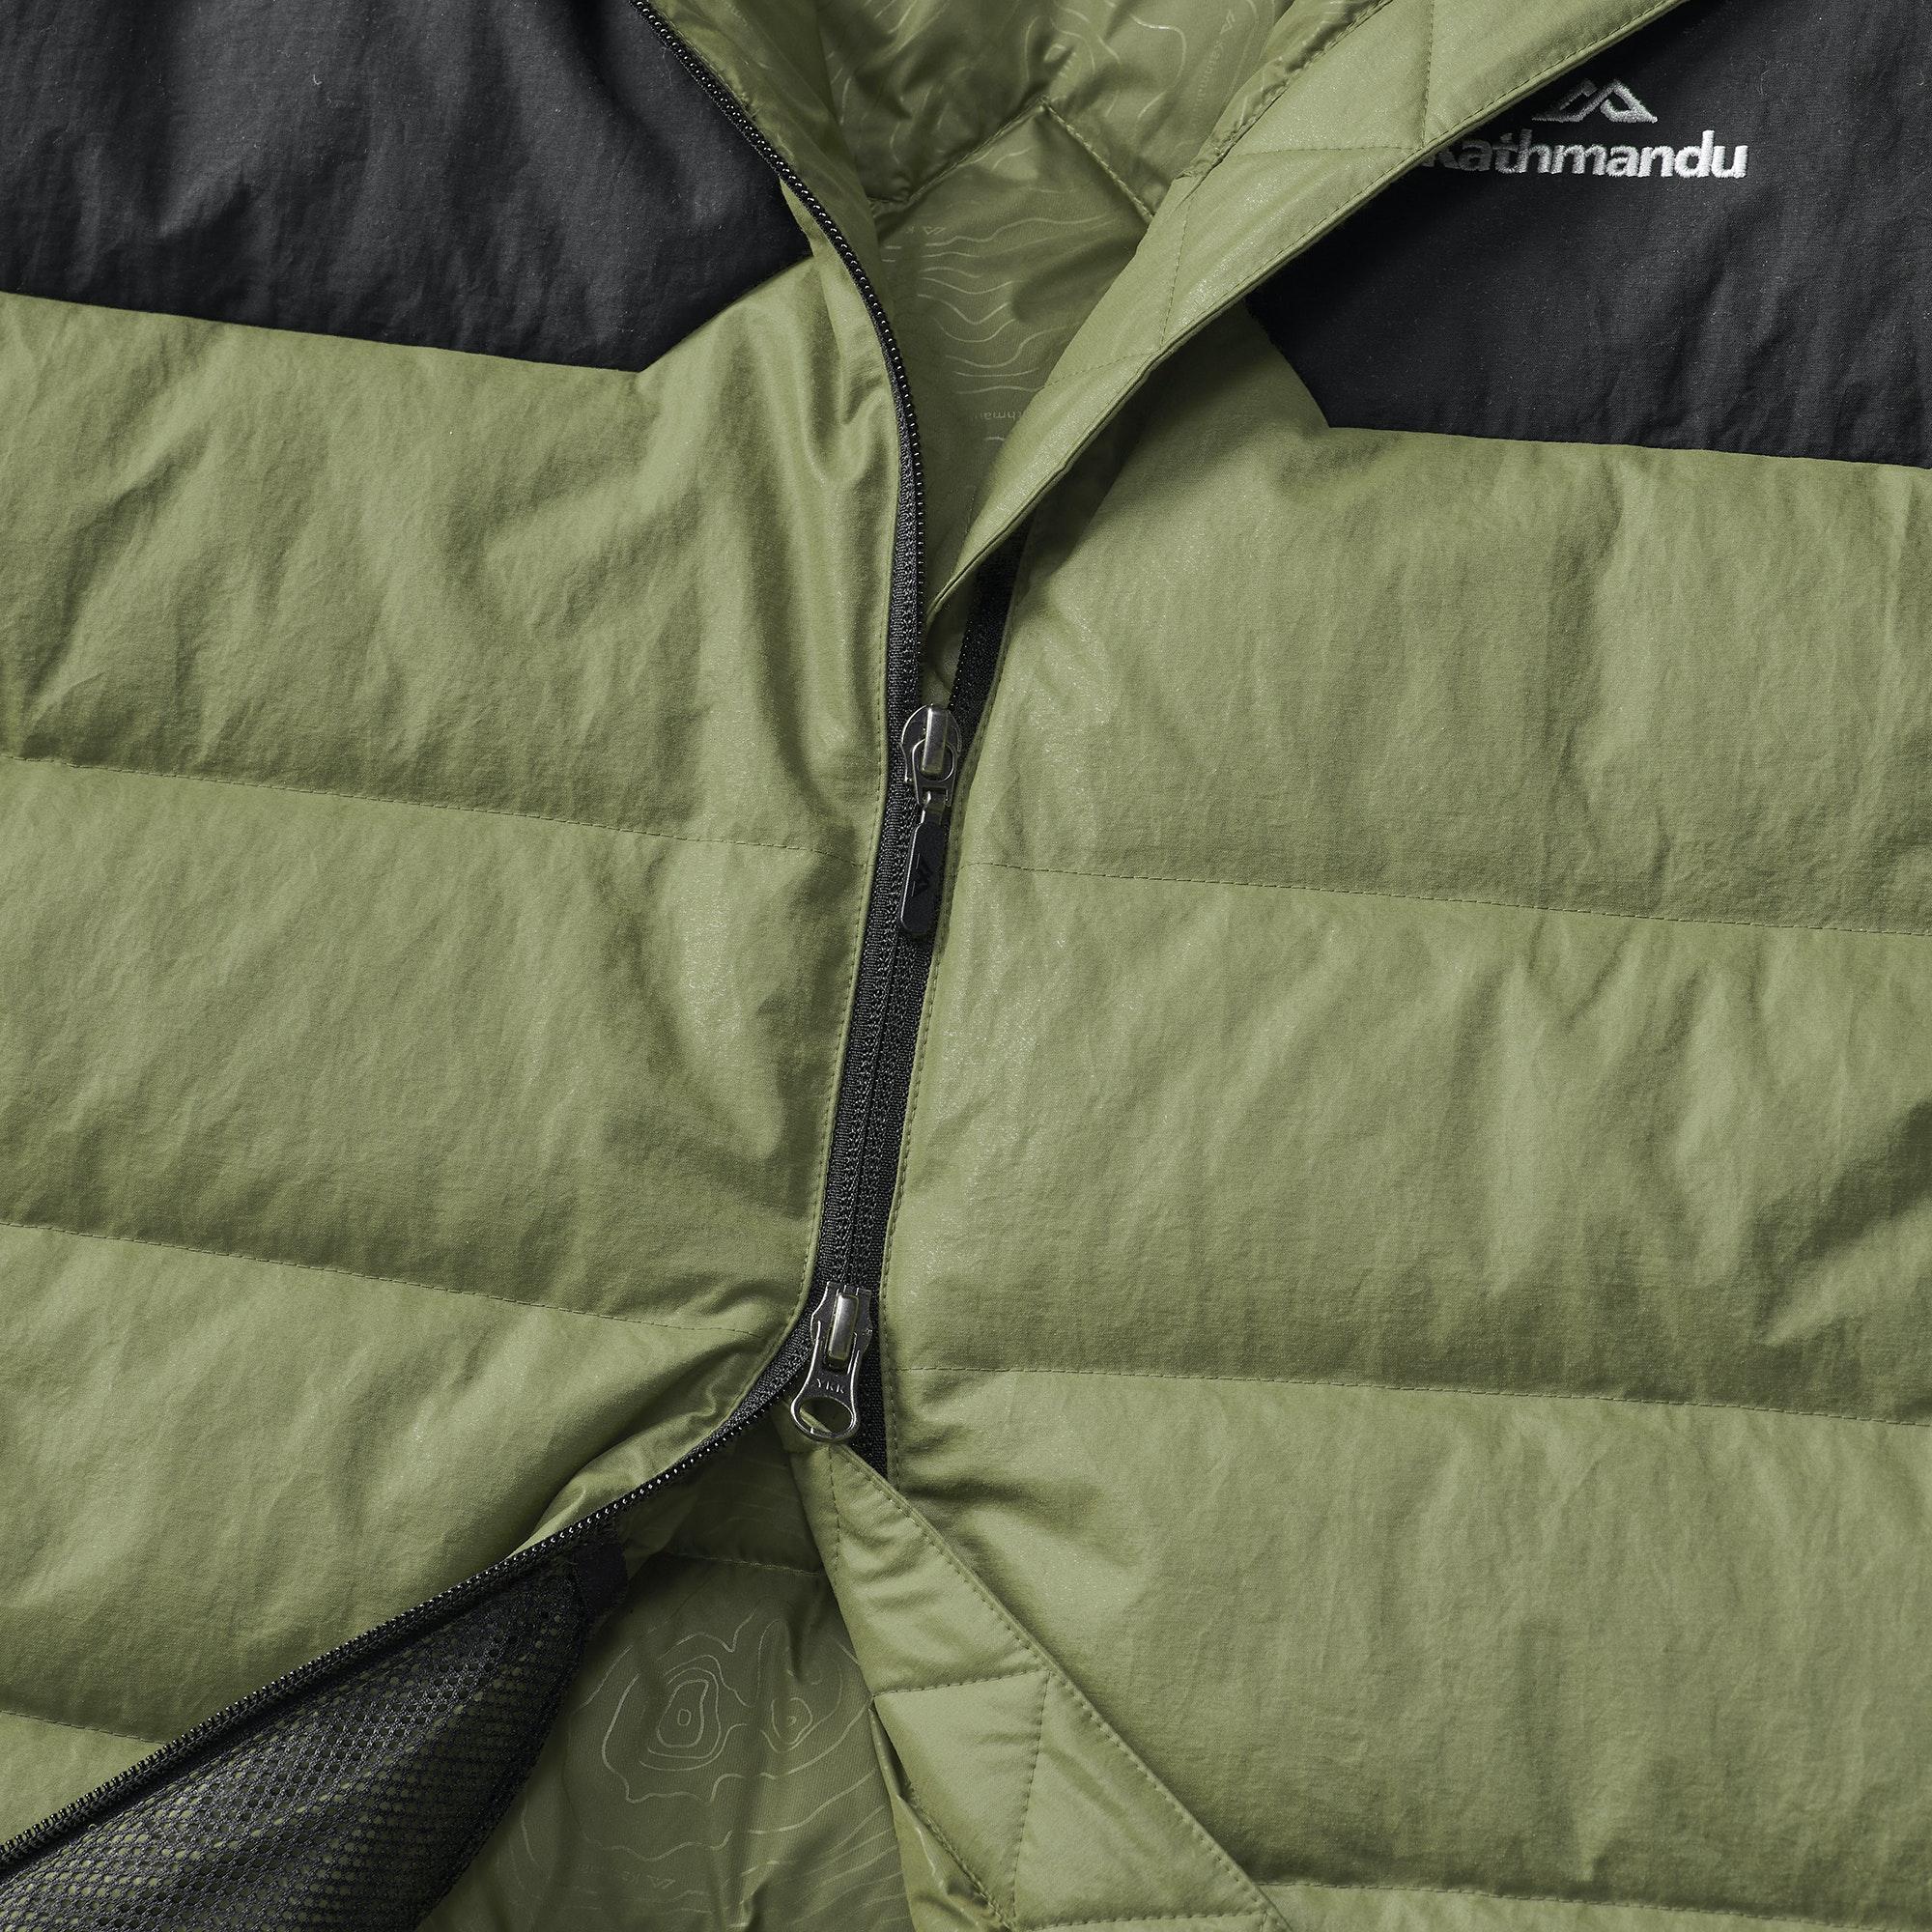 NEW-Kathmandu-Epiq-Men-039-s-Hooded-Warm-Winter-Duck-Down-Puffer-Jacket-v2 thumbnail 24